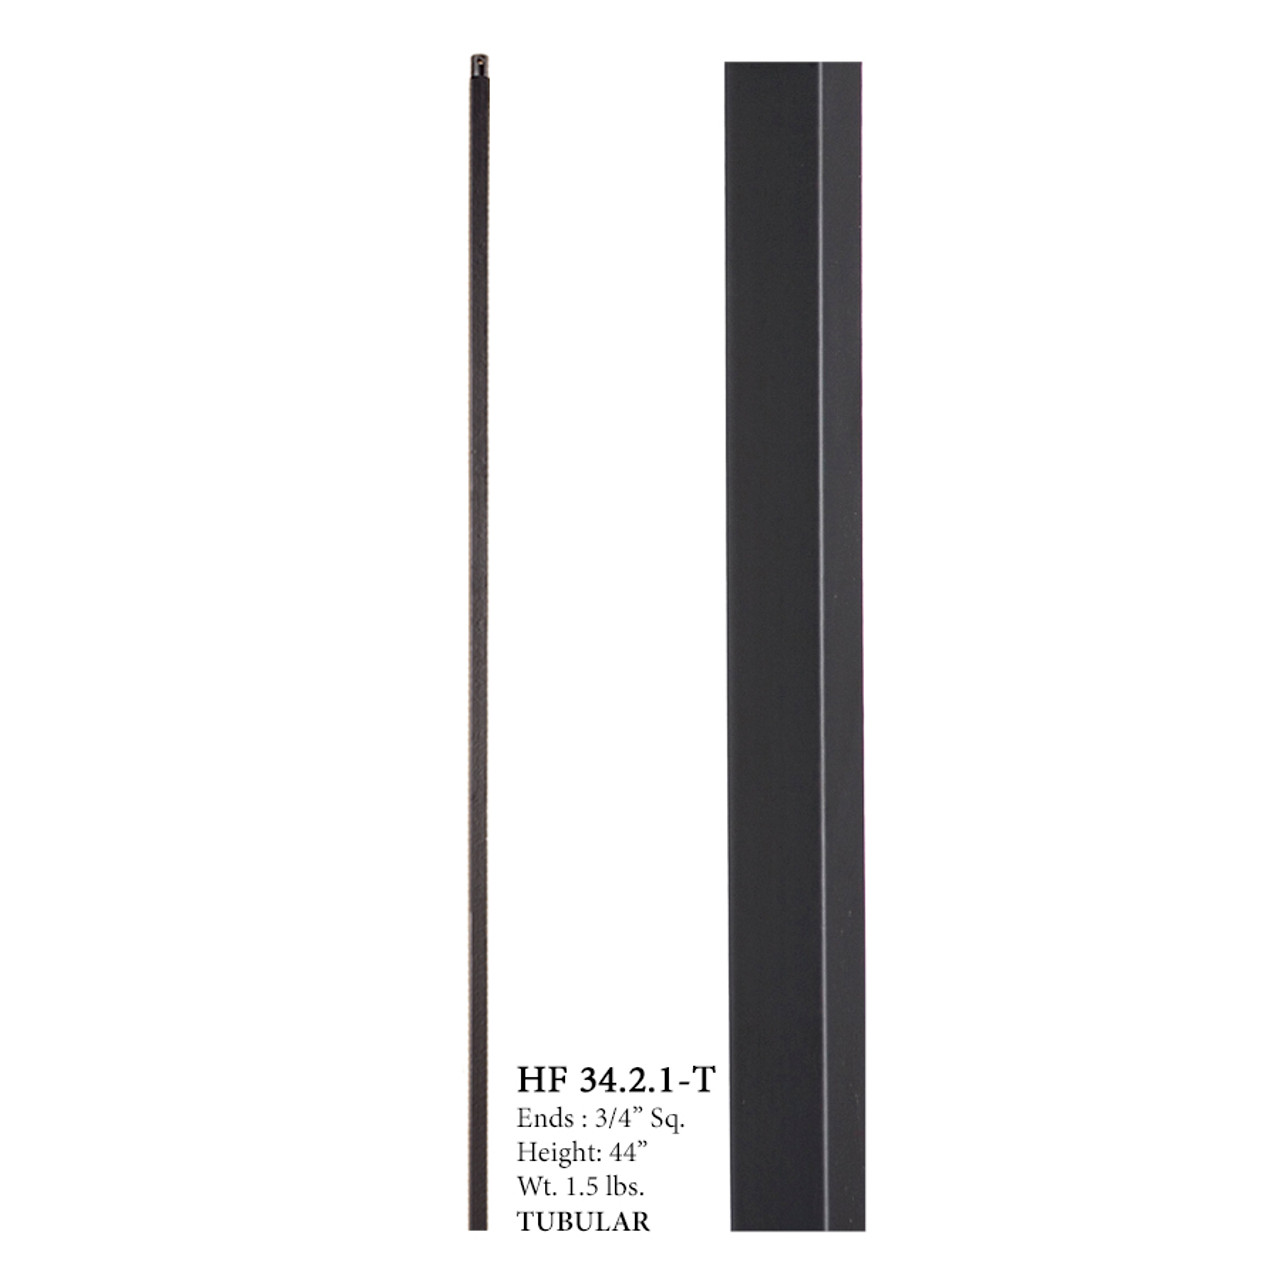 HF34.2.1-T MEGA Plain Square Bar Tubular Steel Baluster